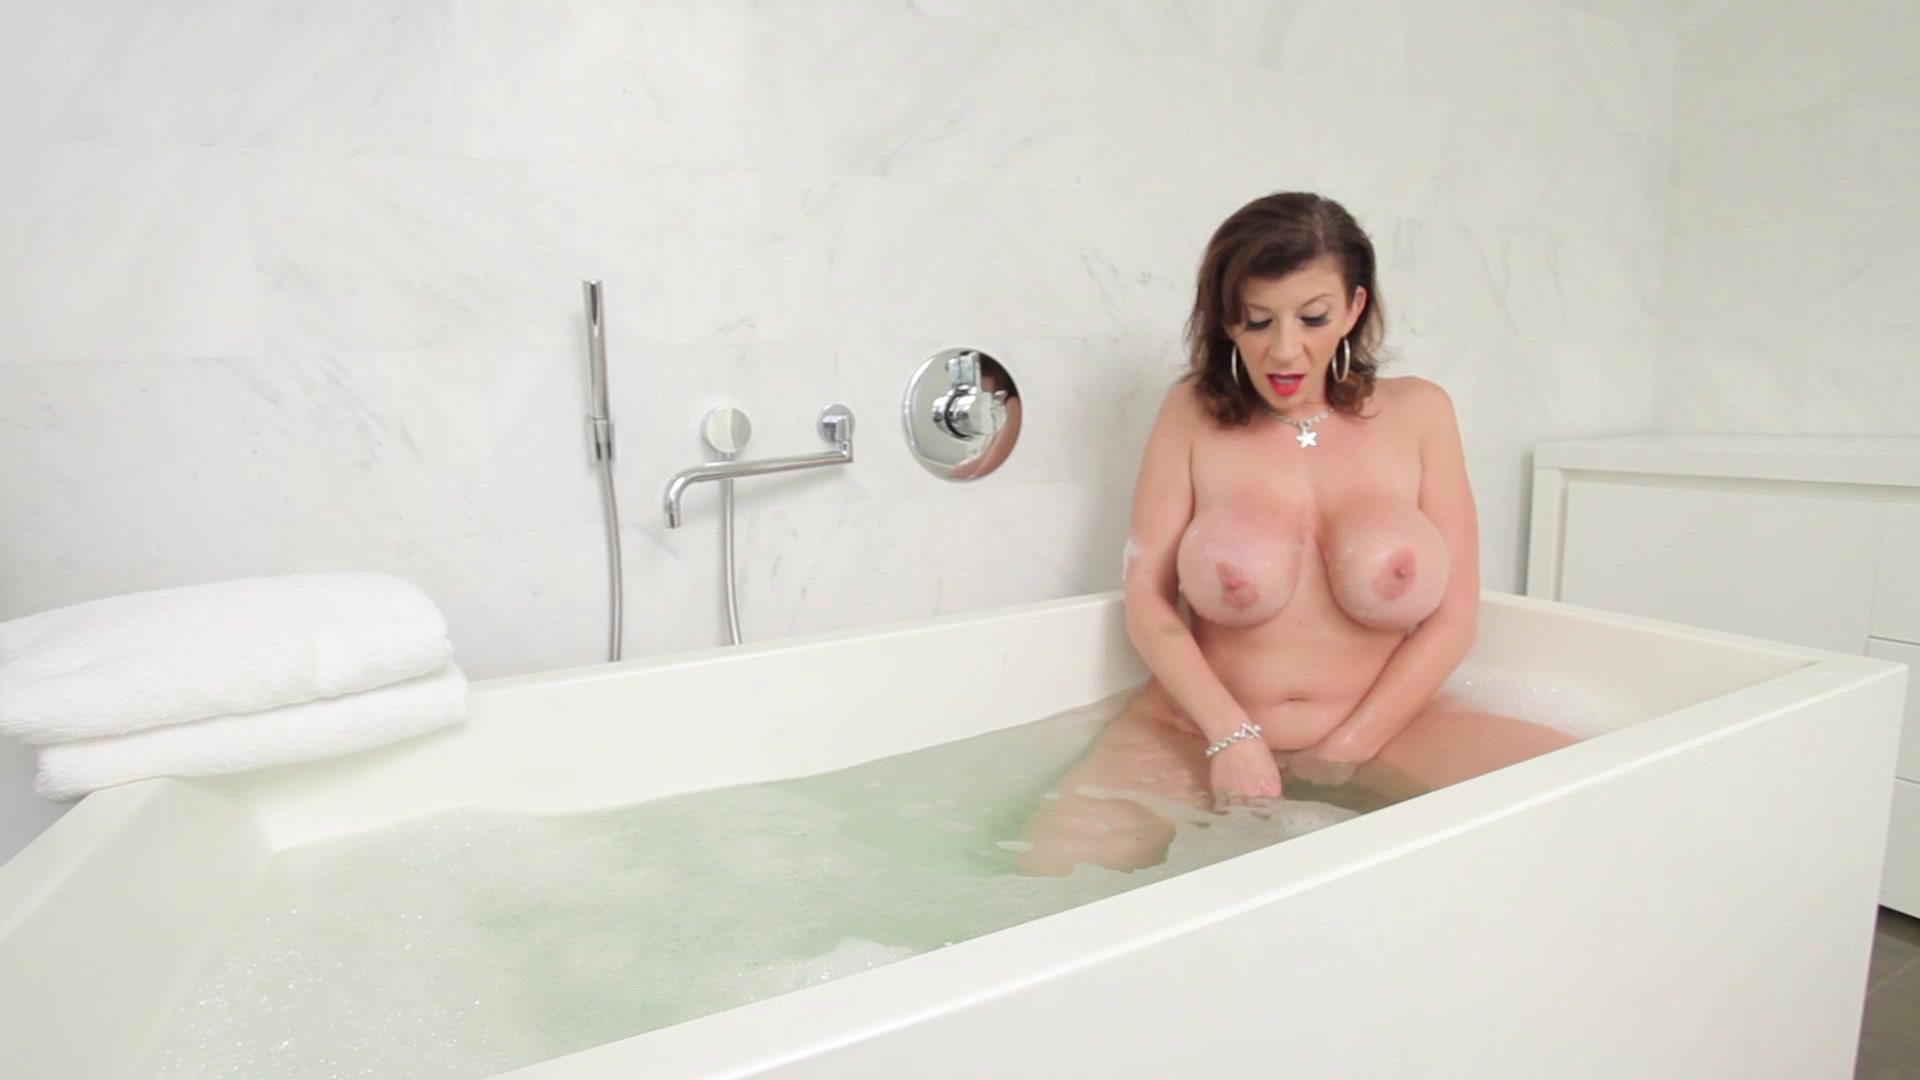 sara-jay-nude-shower-free-oriental-erotic-massage-video